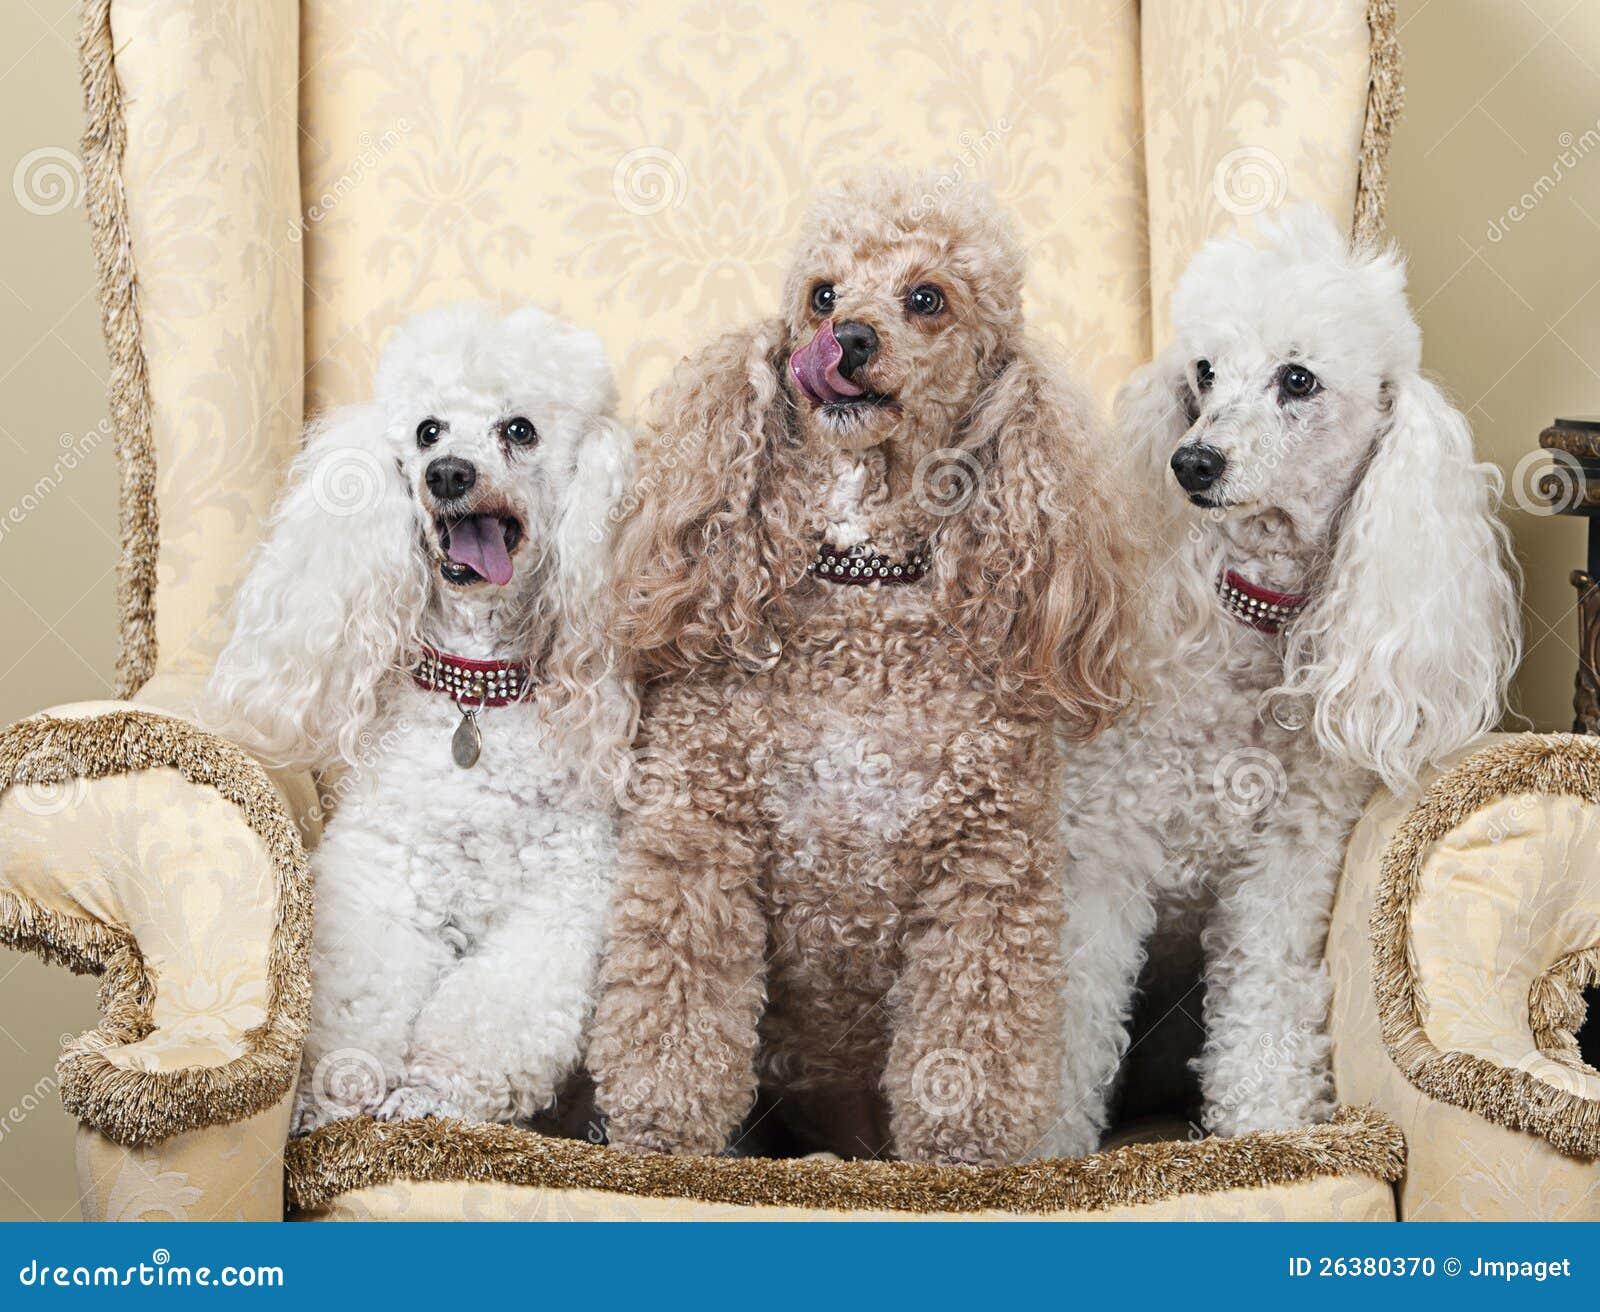 Z Poodles French Poodles Royalty...